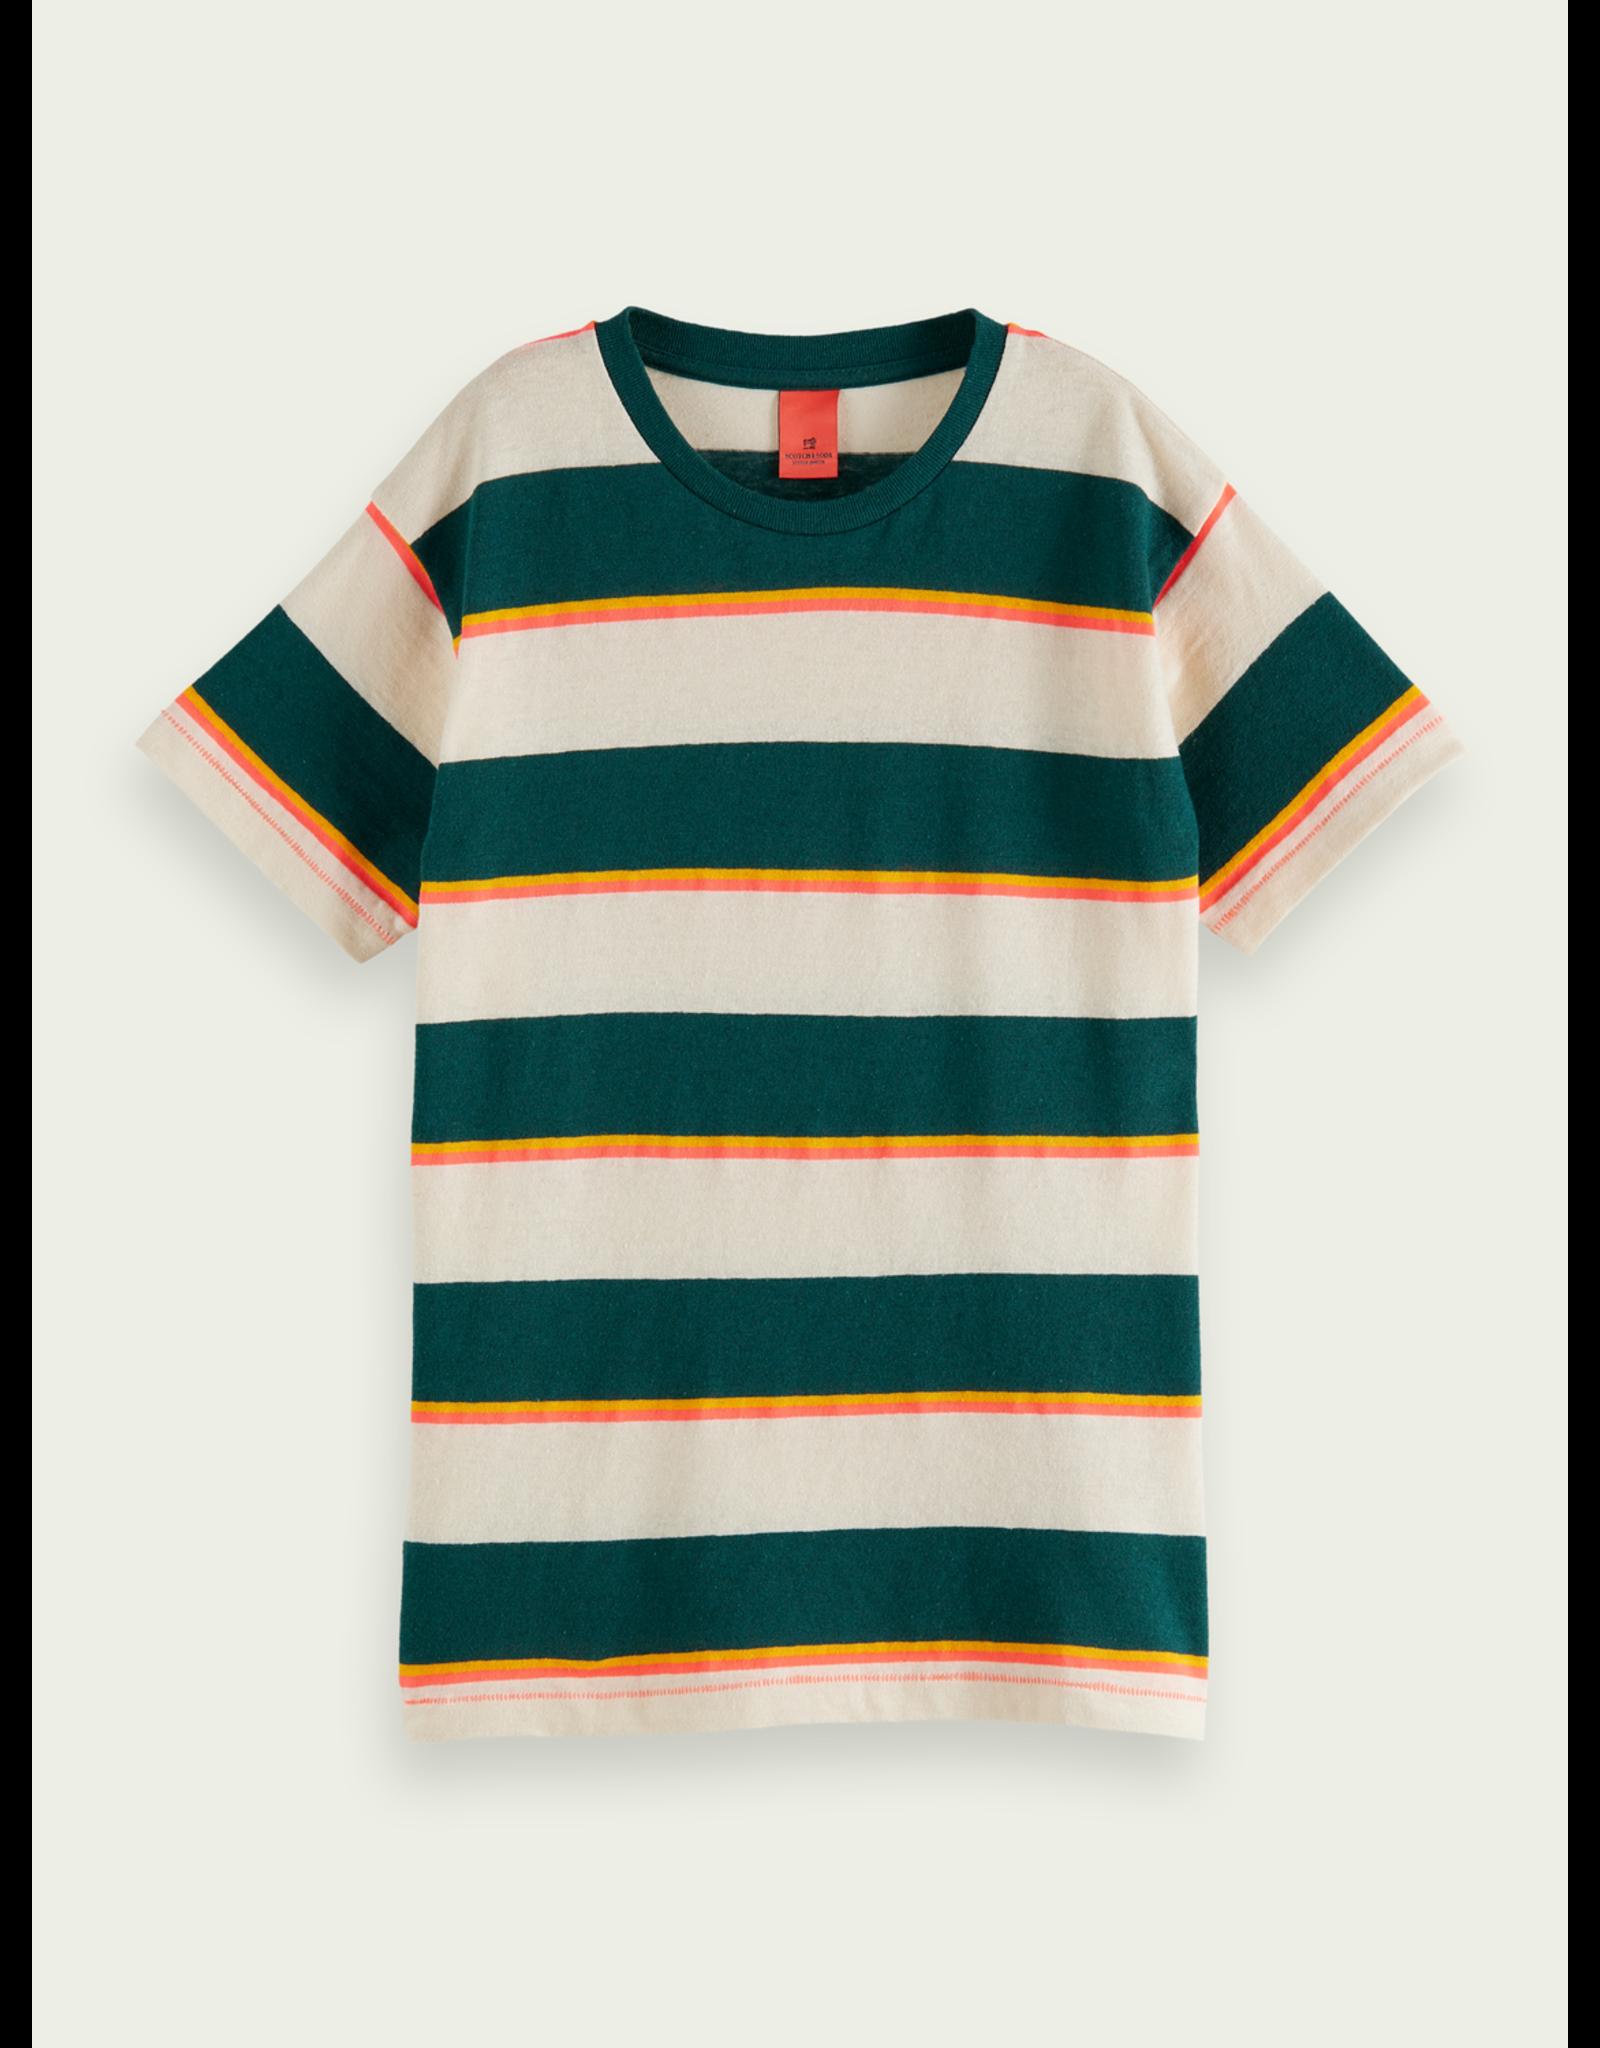 Scotch&Soda Shrunk SS21 161127 striped shirt